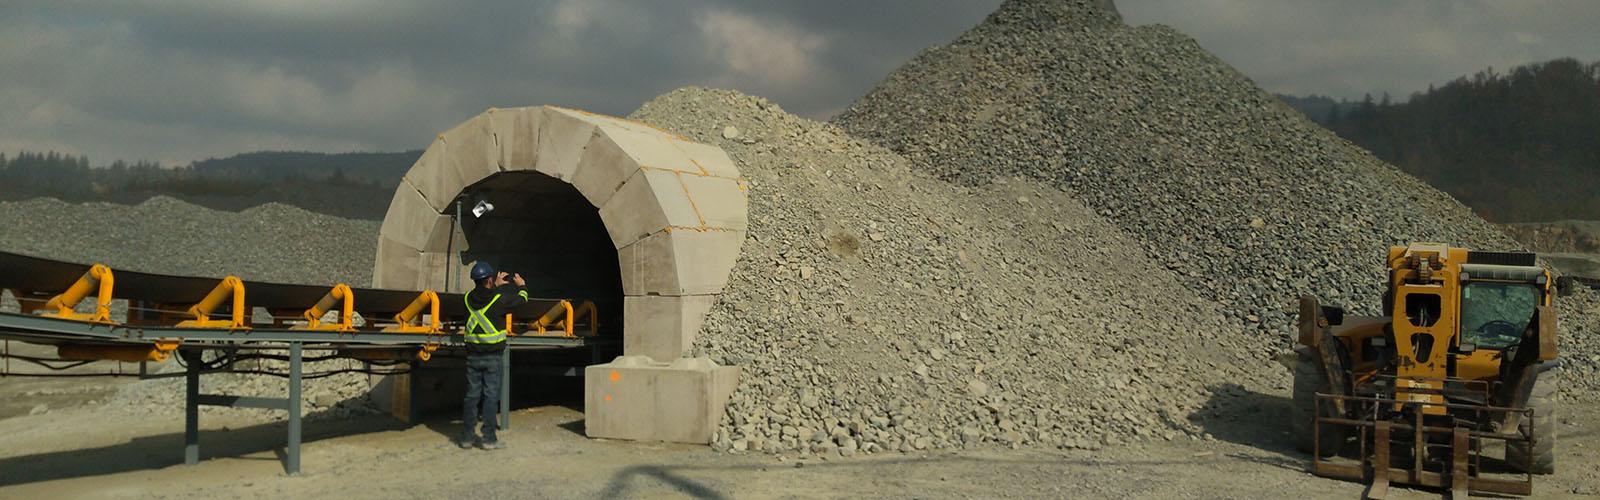 Gravel pit arch